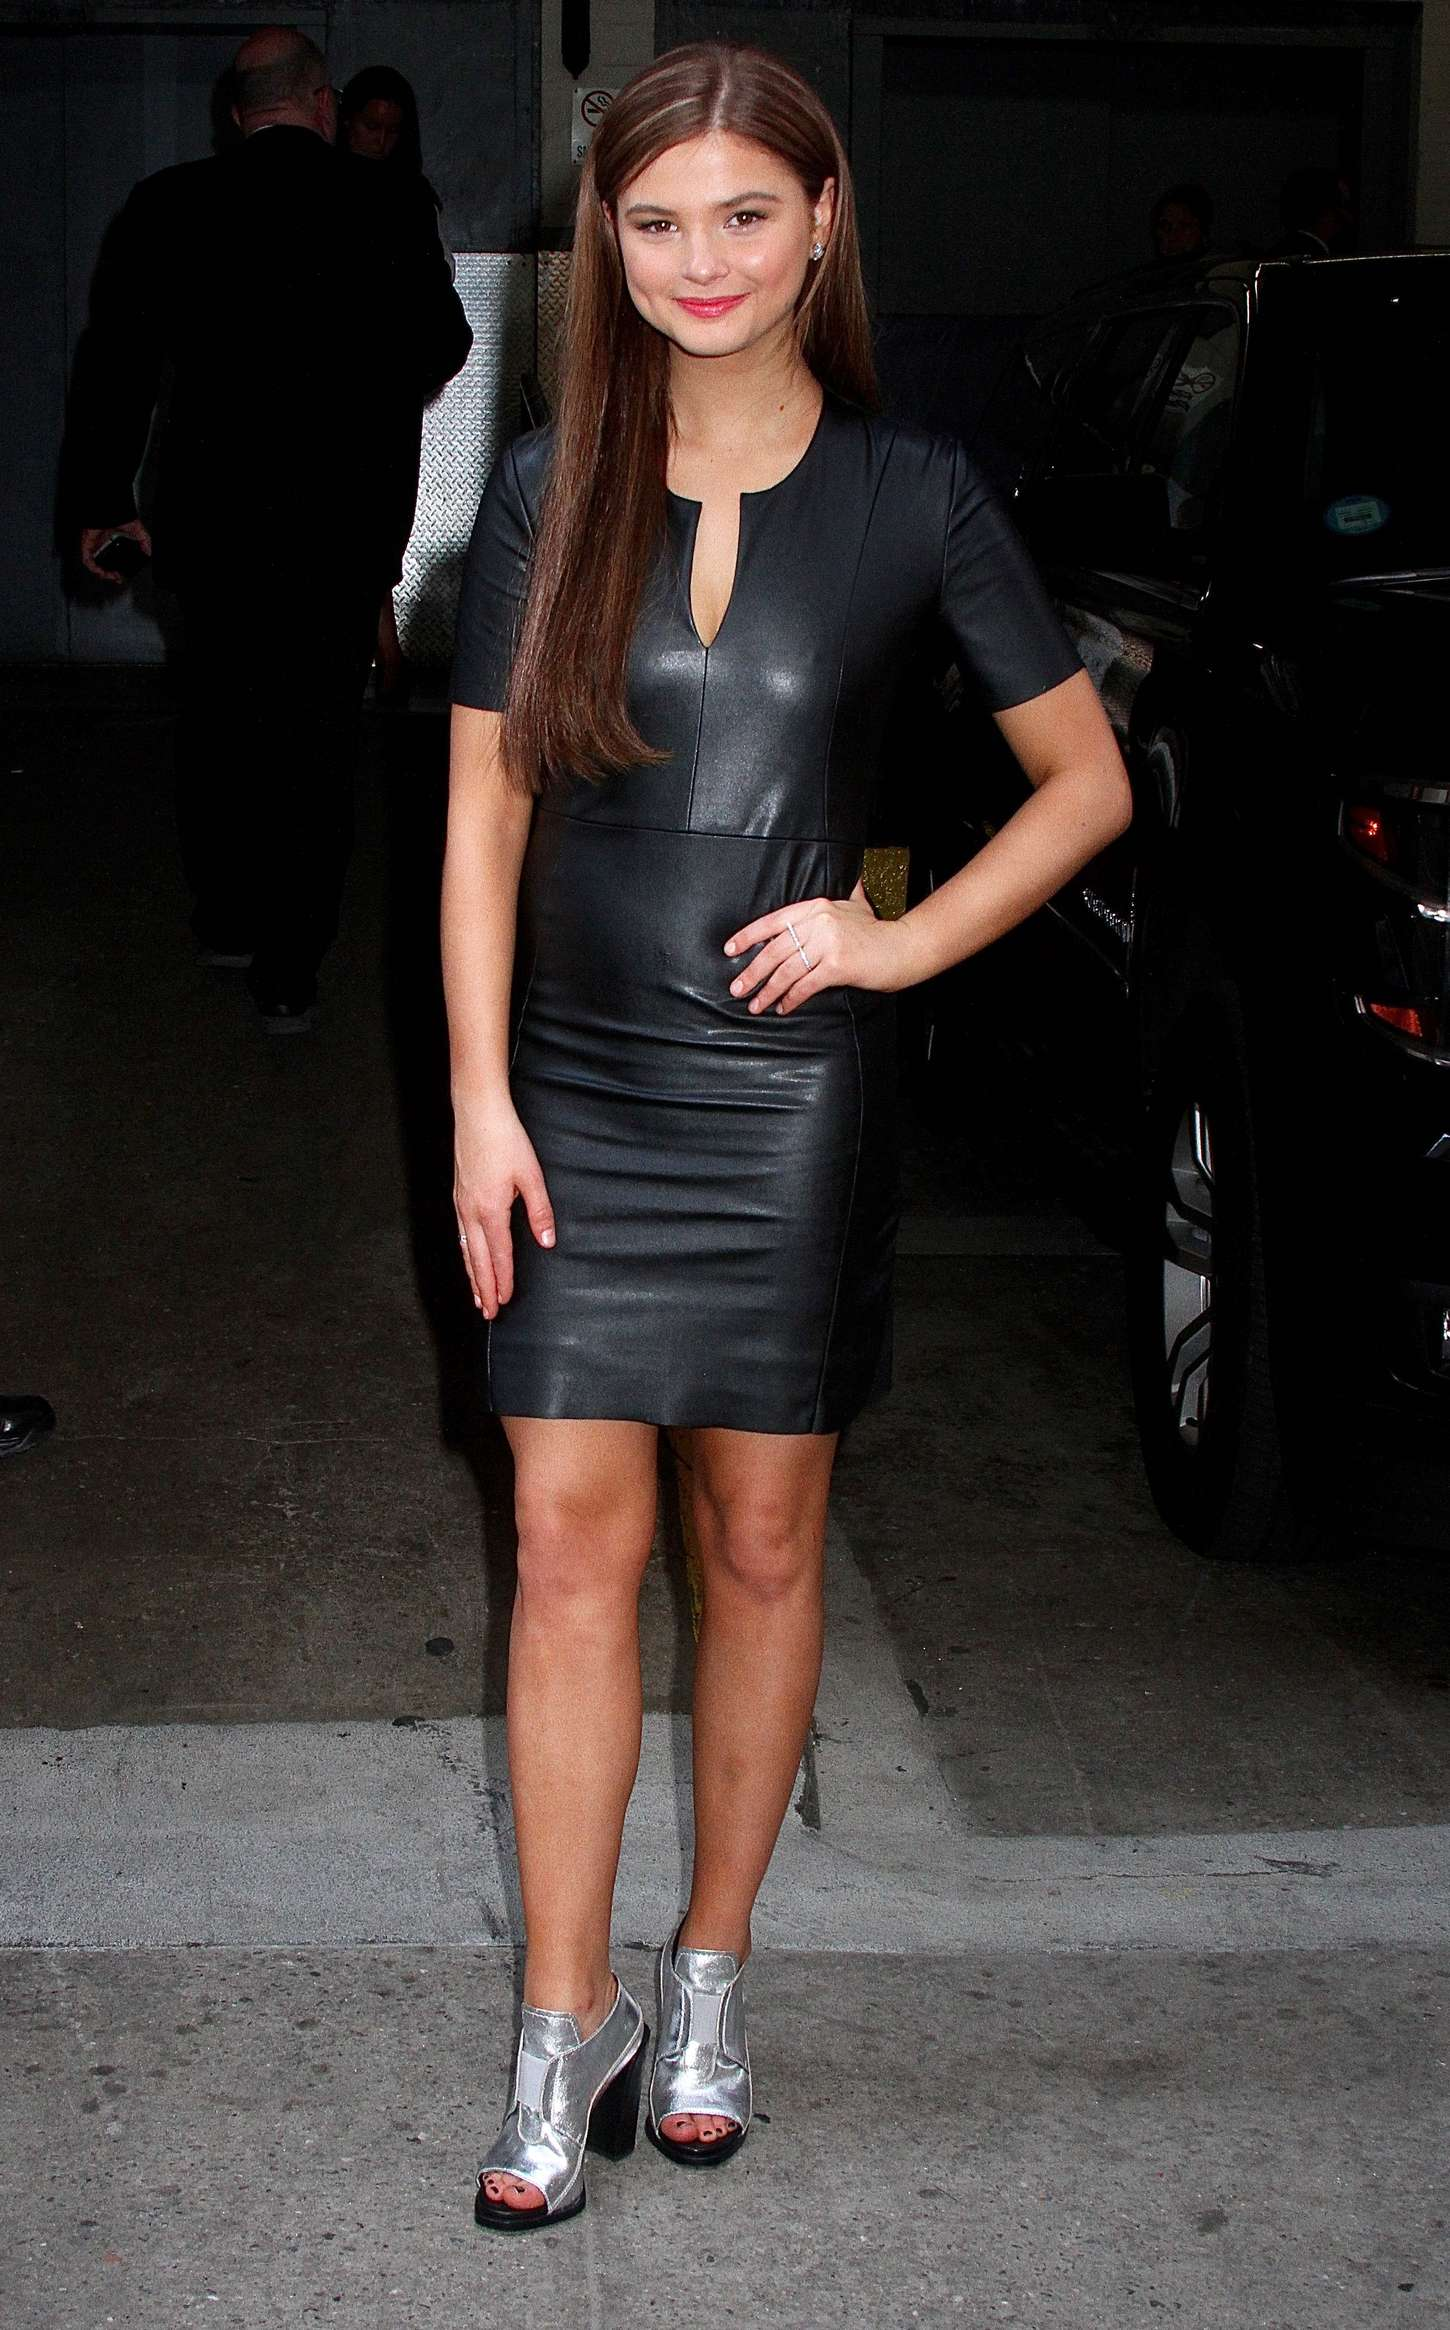 Stefanie Scott In Leather Mini Dress 18 Gotceleb